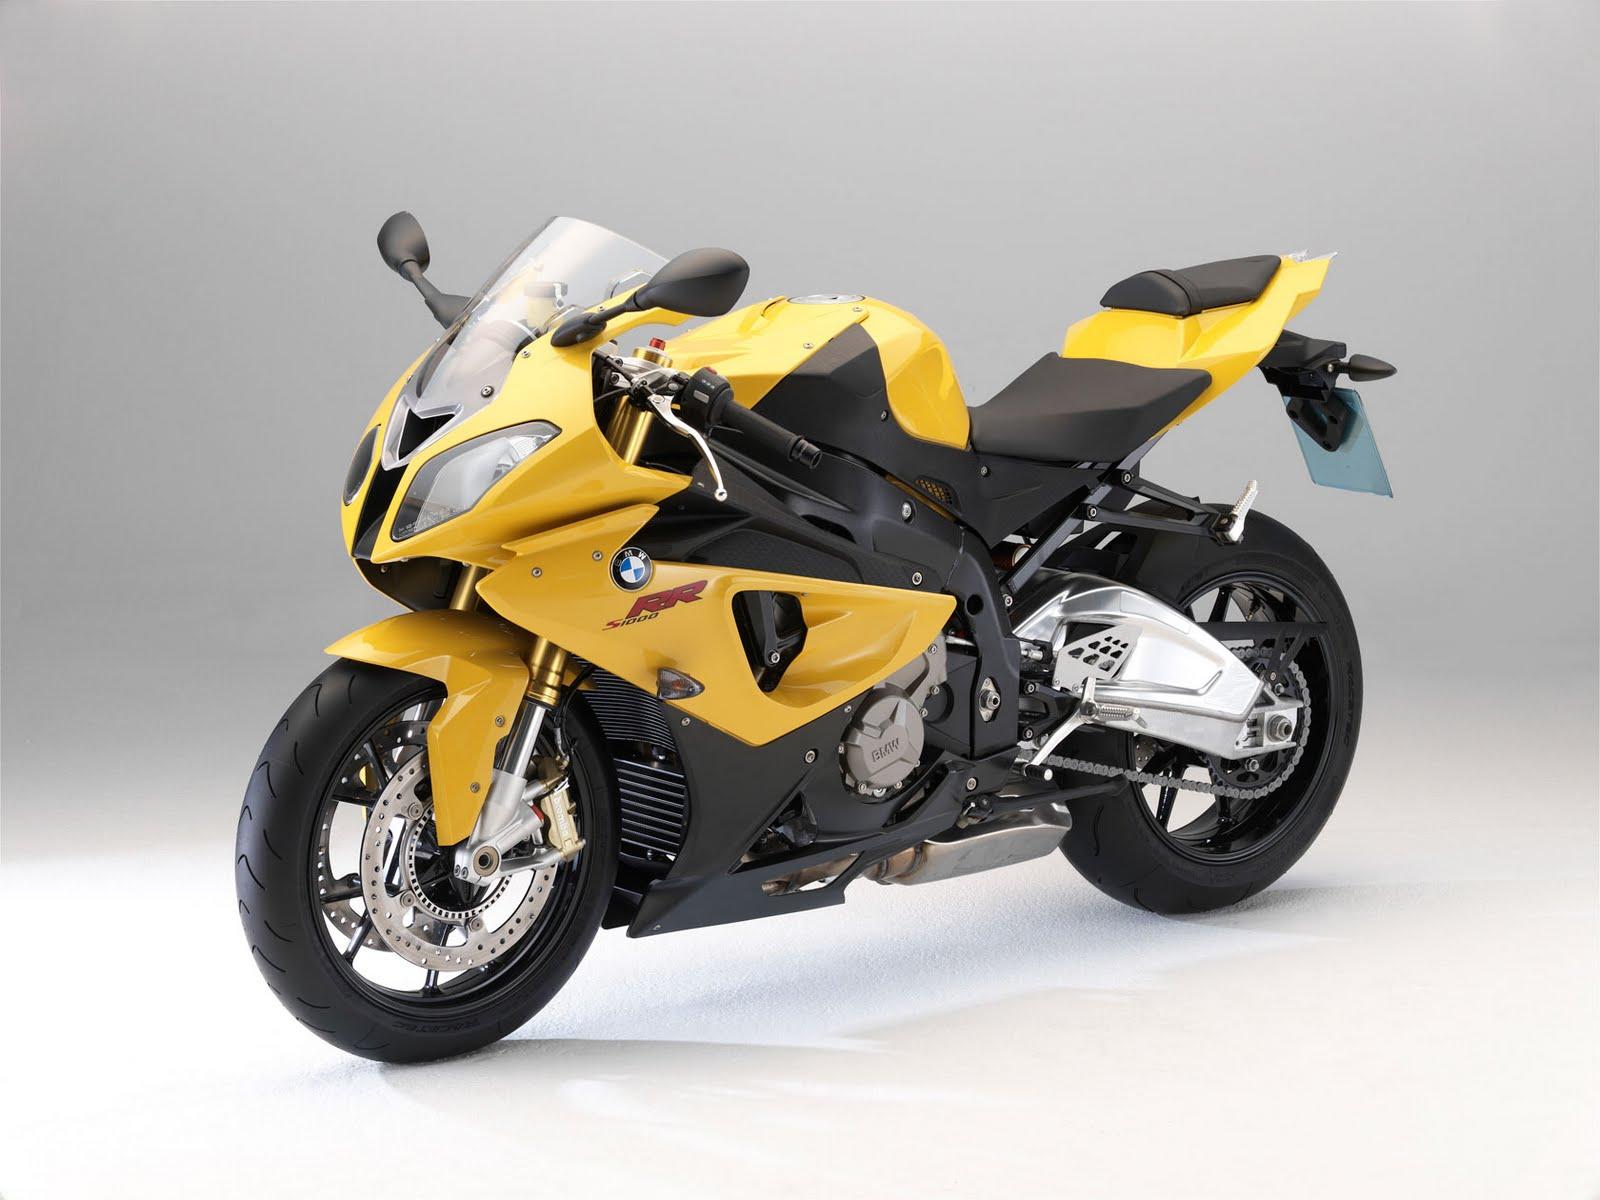 http://1.bp.blogspot.com/-DJ7YNhB5Uig/TeJ3z4FlWtI/AAAAAAAAARs/LoOlDP1Ct08/s1600/2011-BMW-S1000RR-Sportbike.jpg